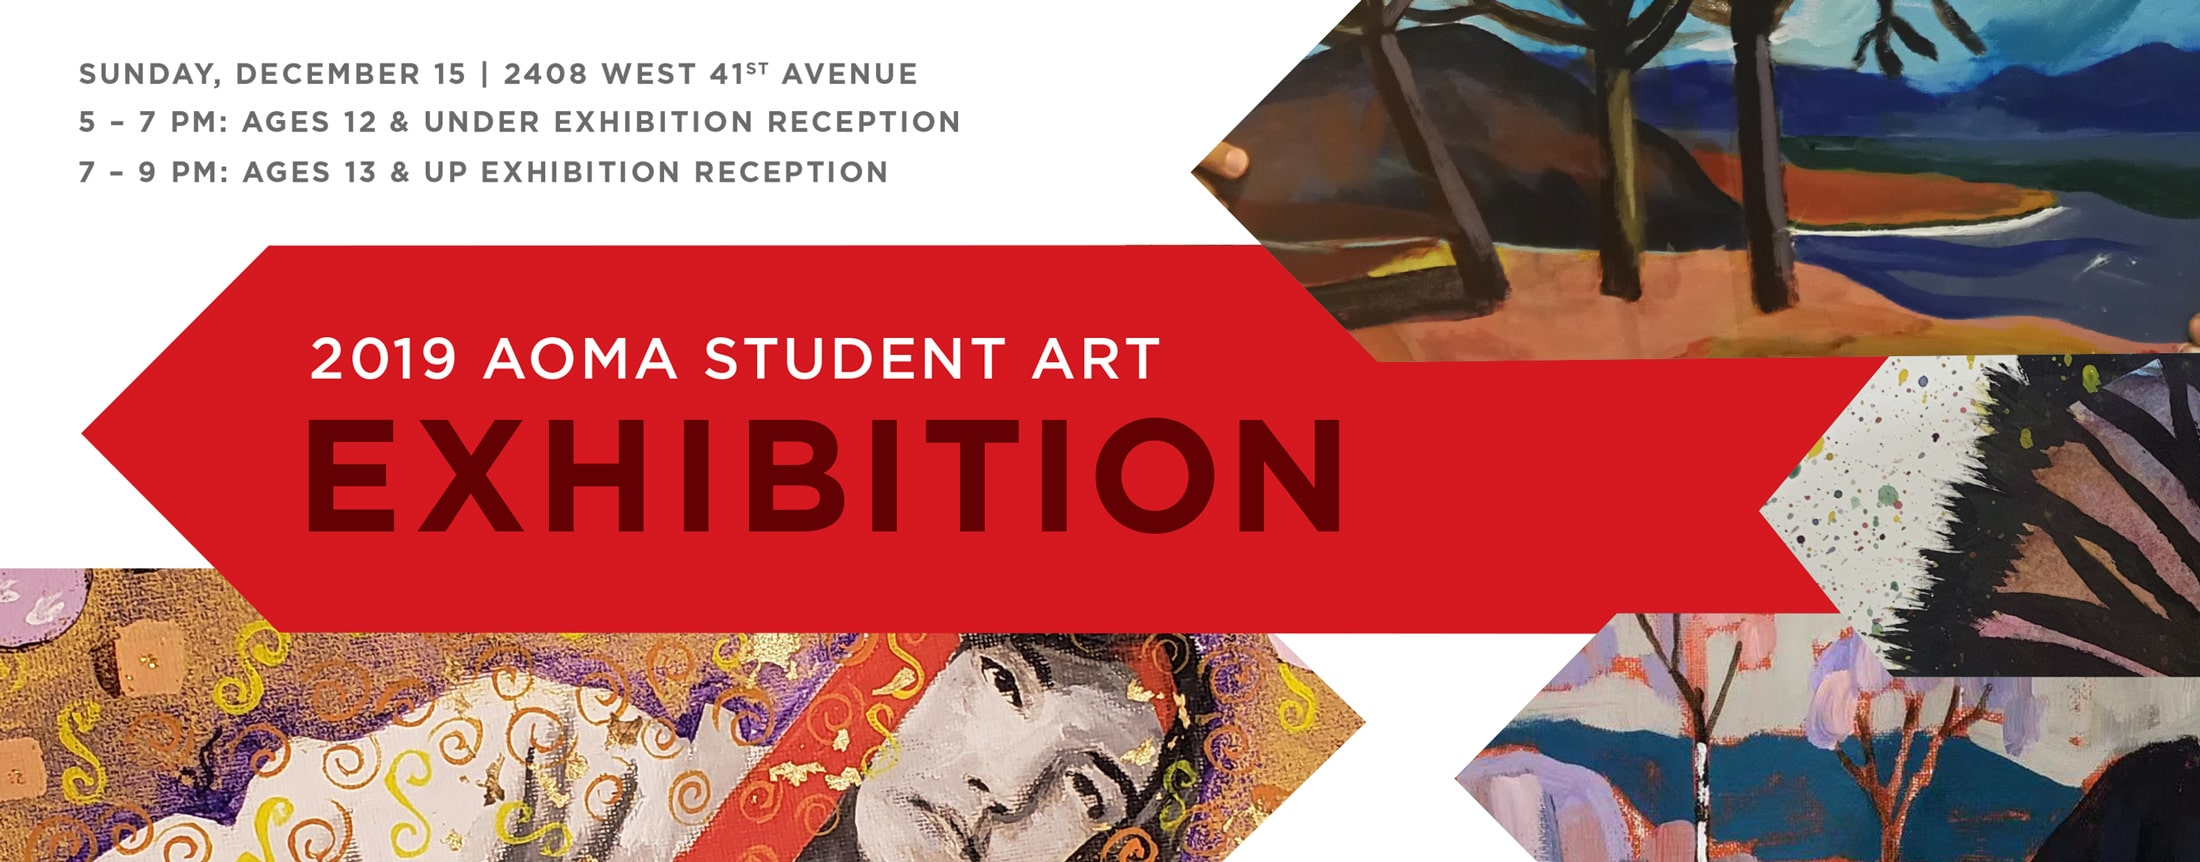 2019 Student Art Exhibition